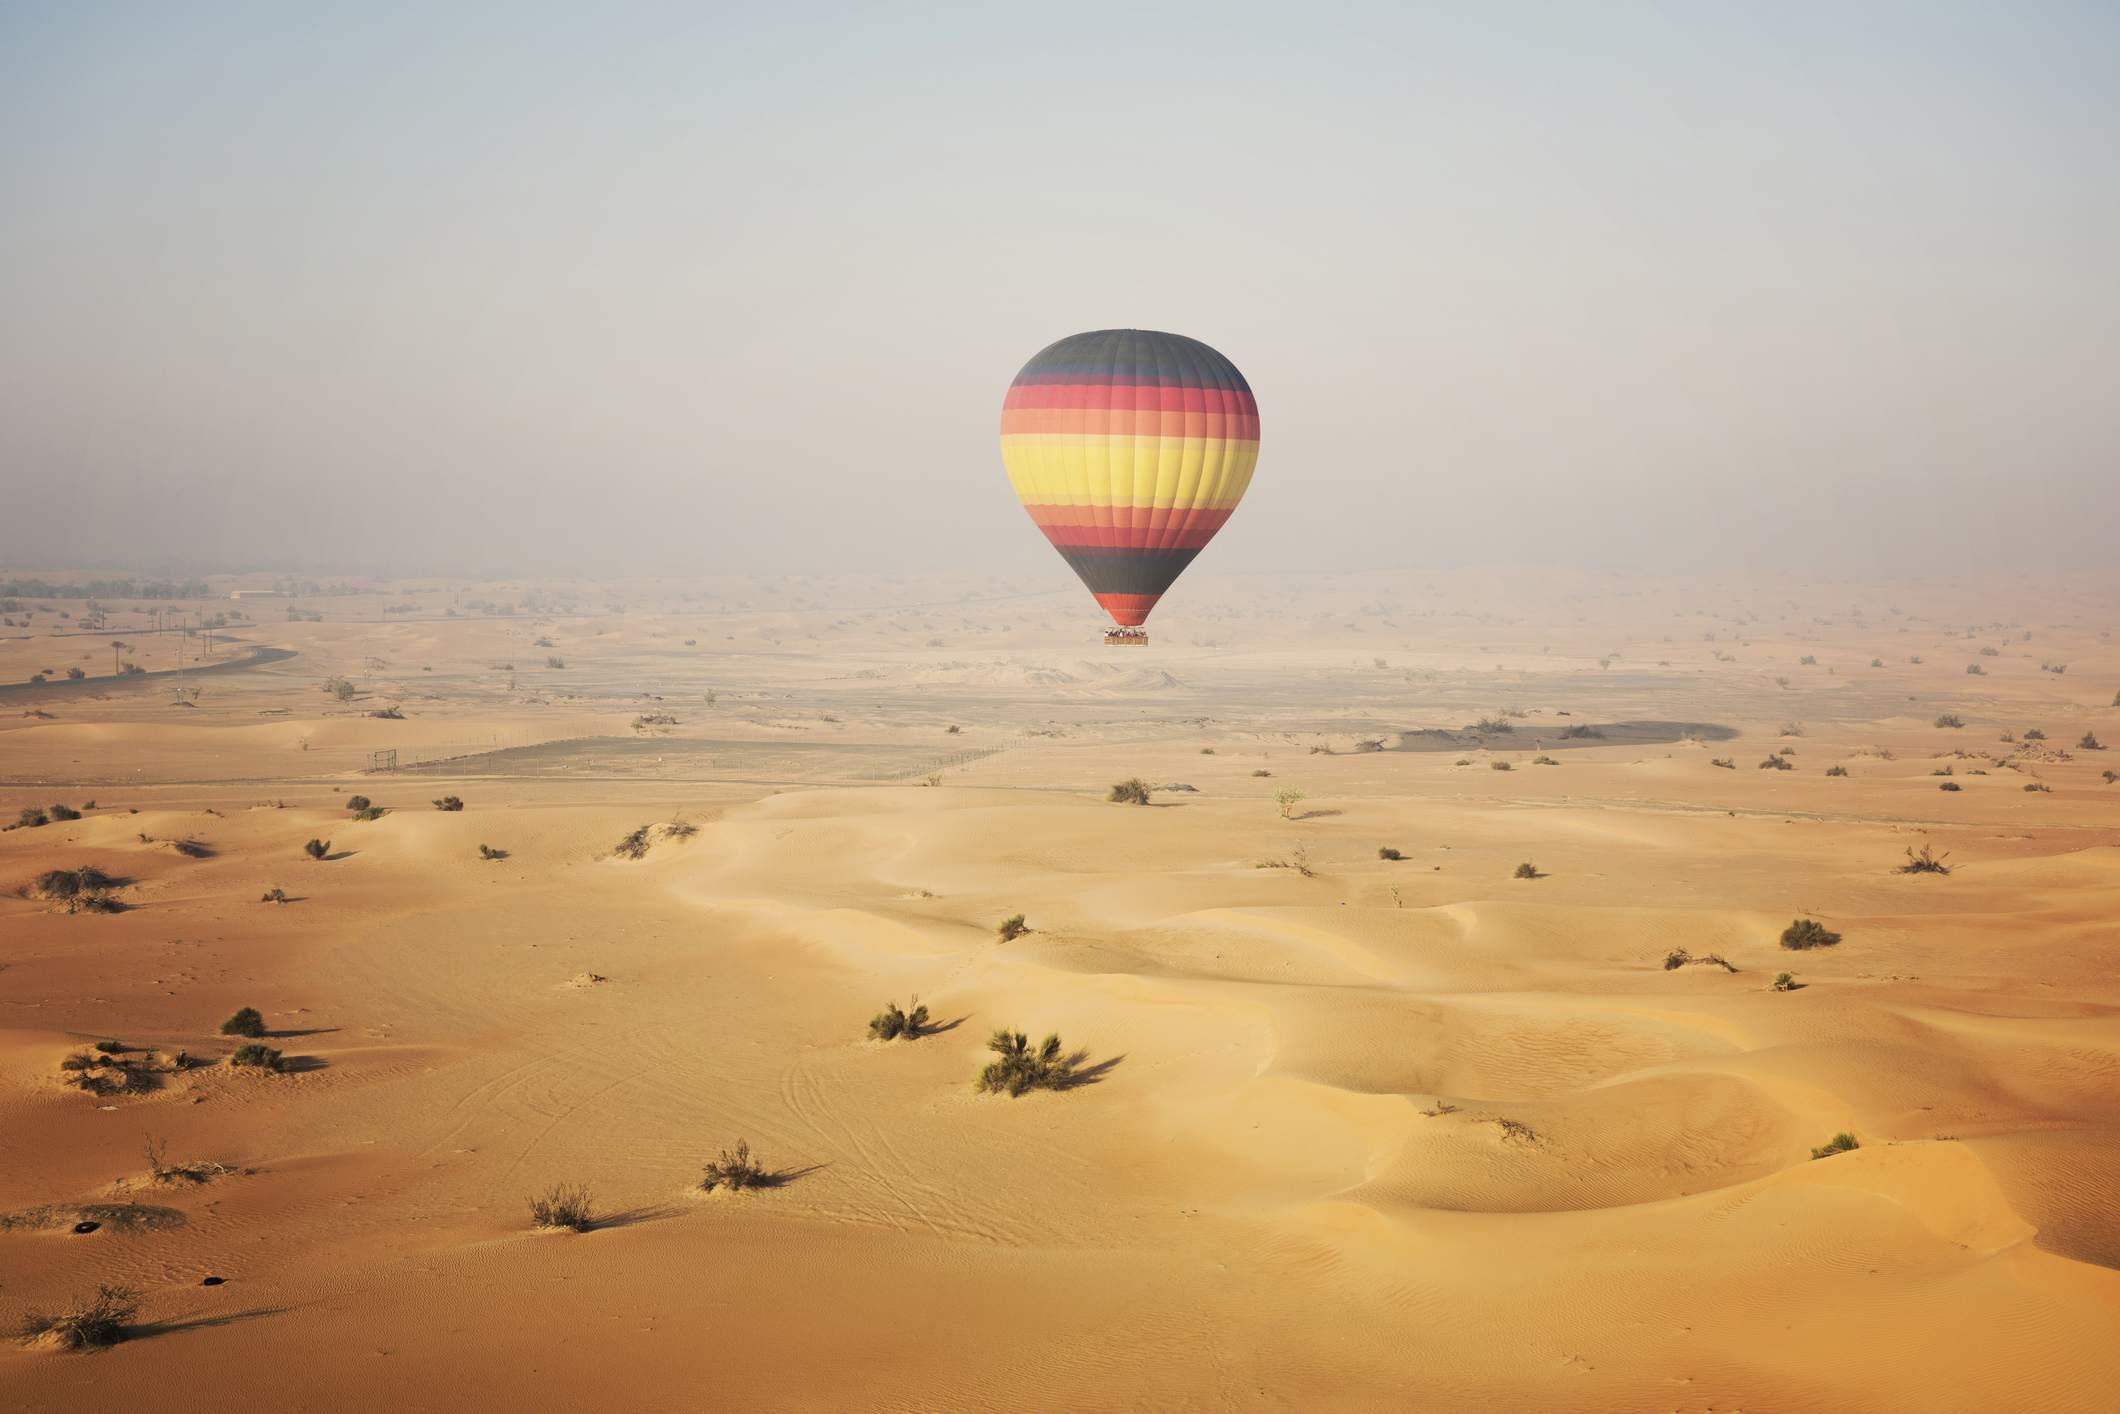 Hot air balloon over the desert, Dubai, UAE